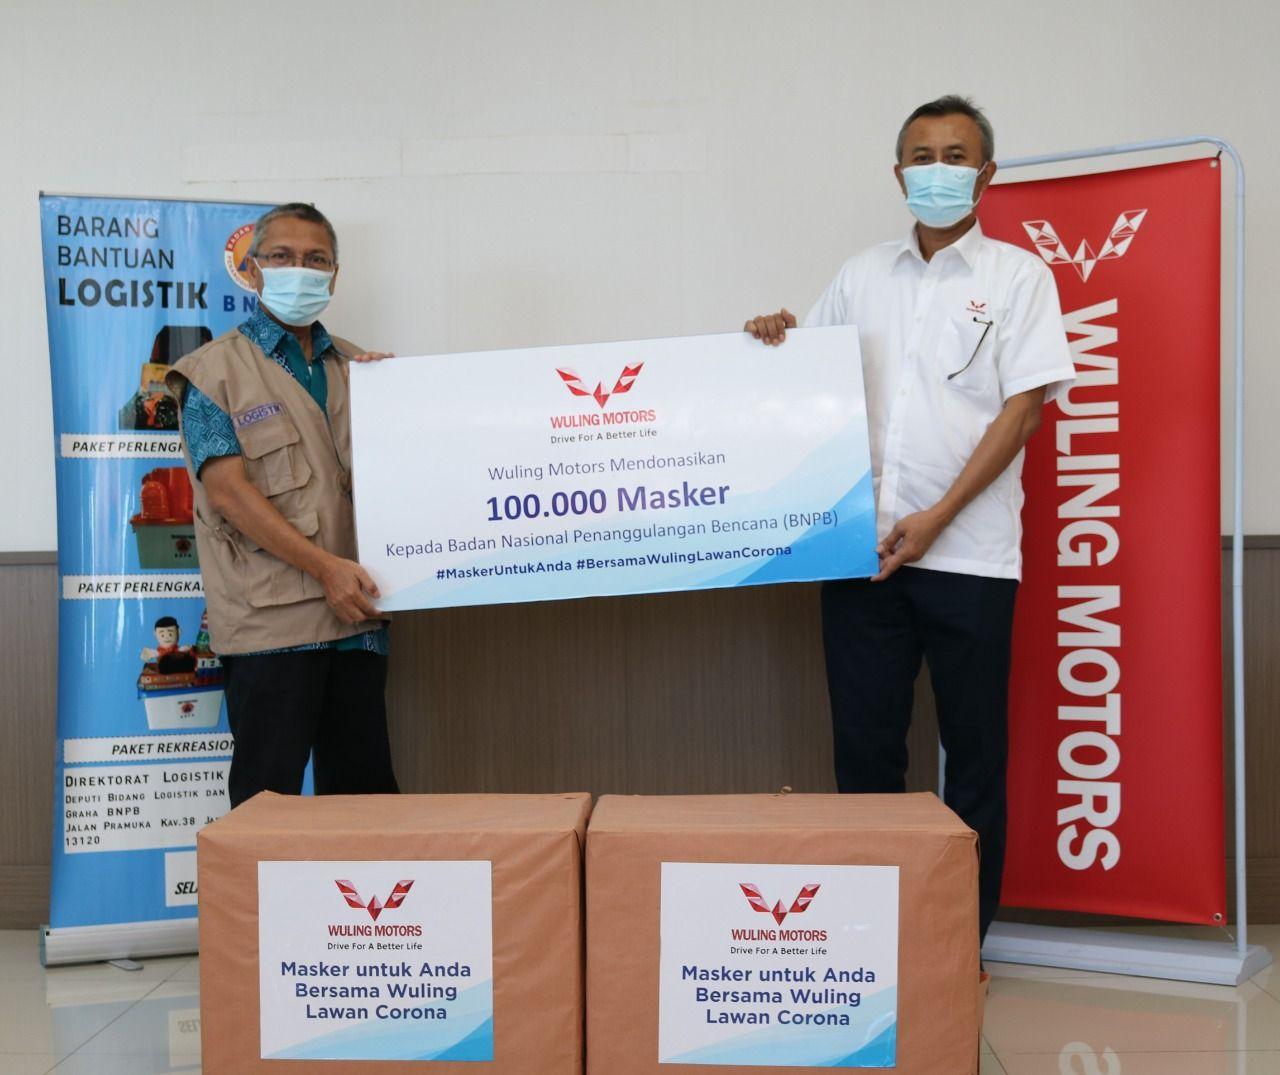 Wuling Motors beri 100.000 masker ke BNPB